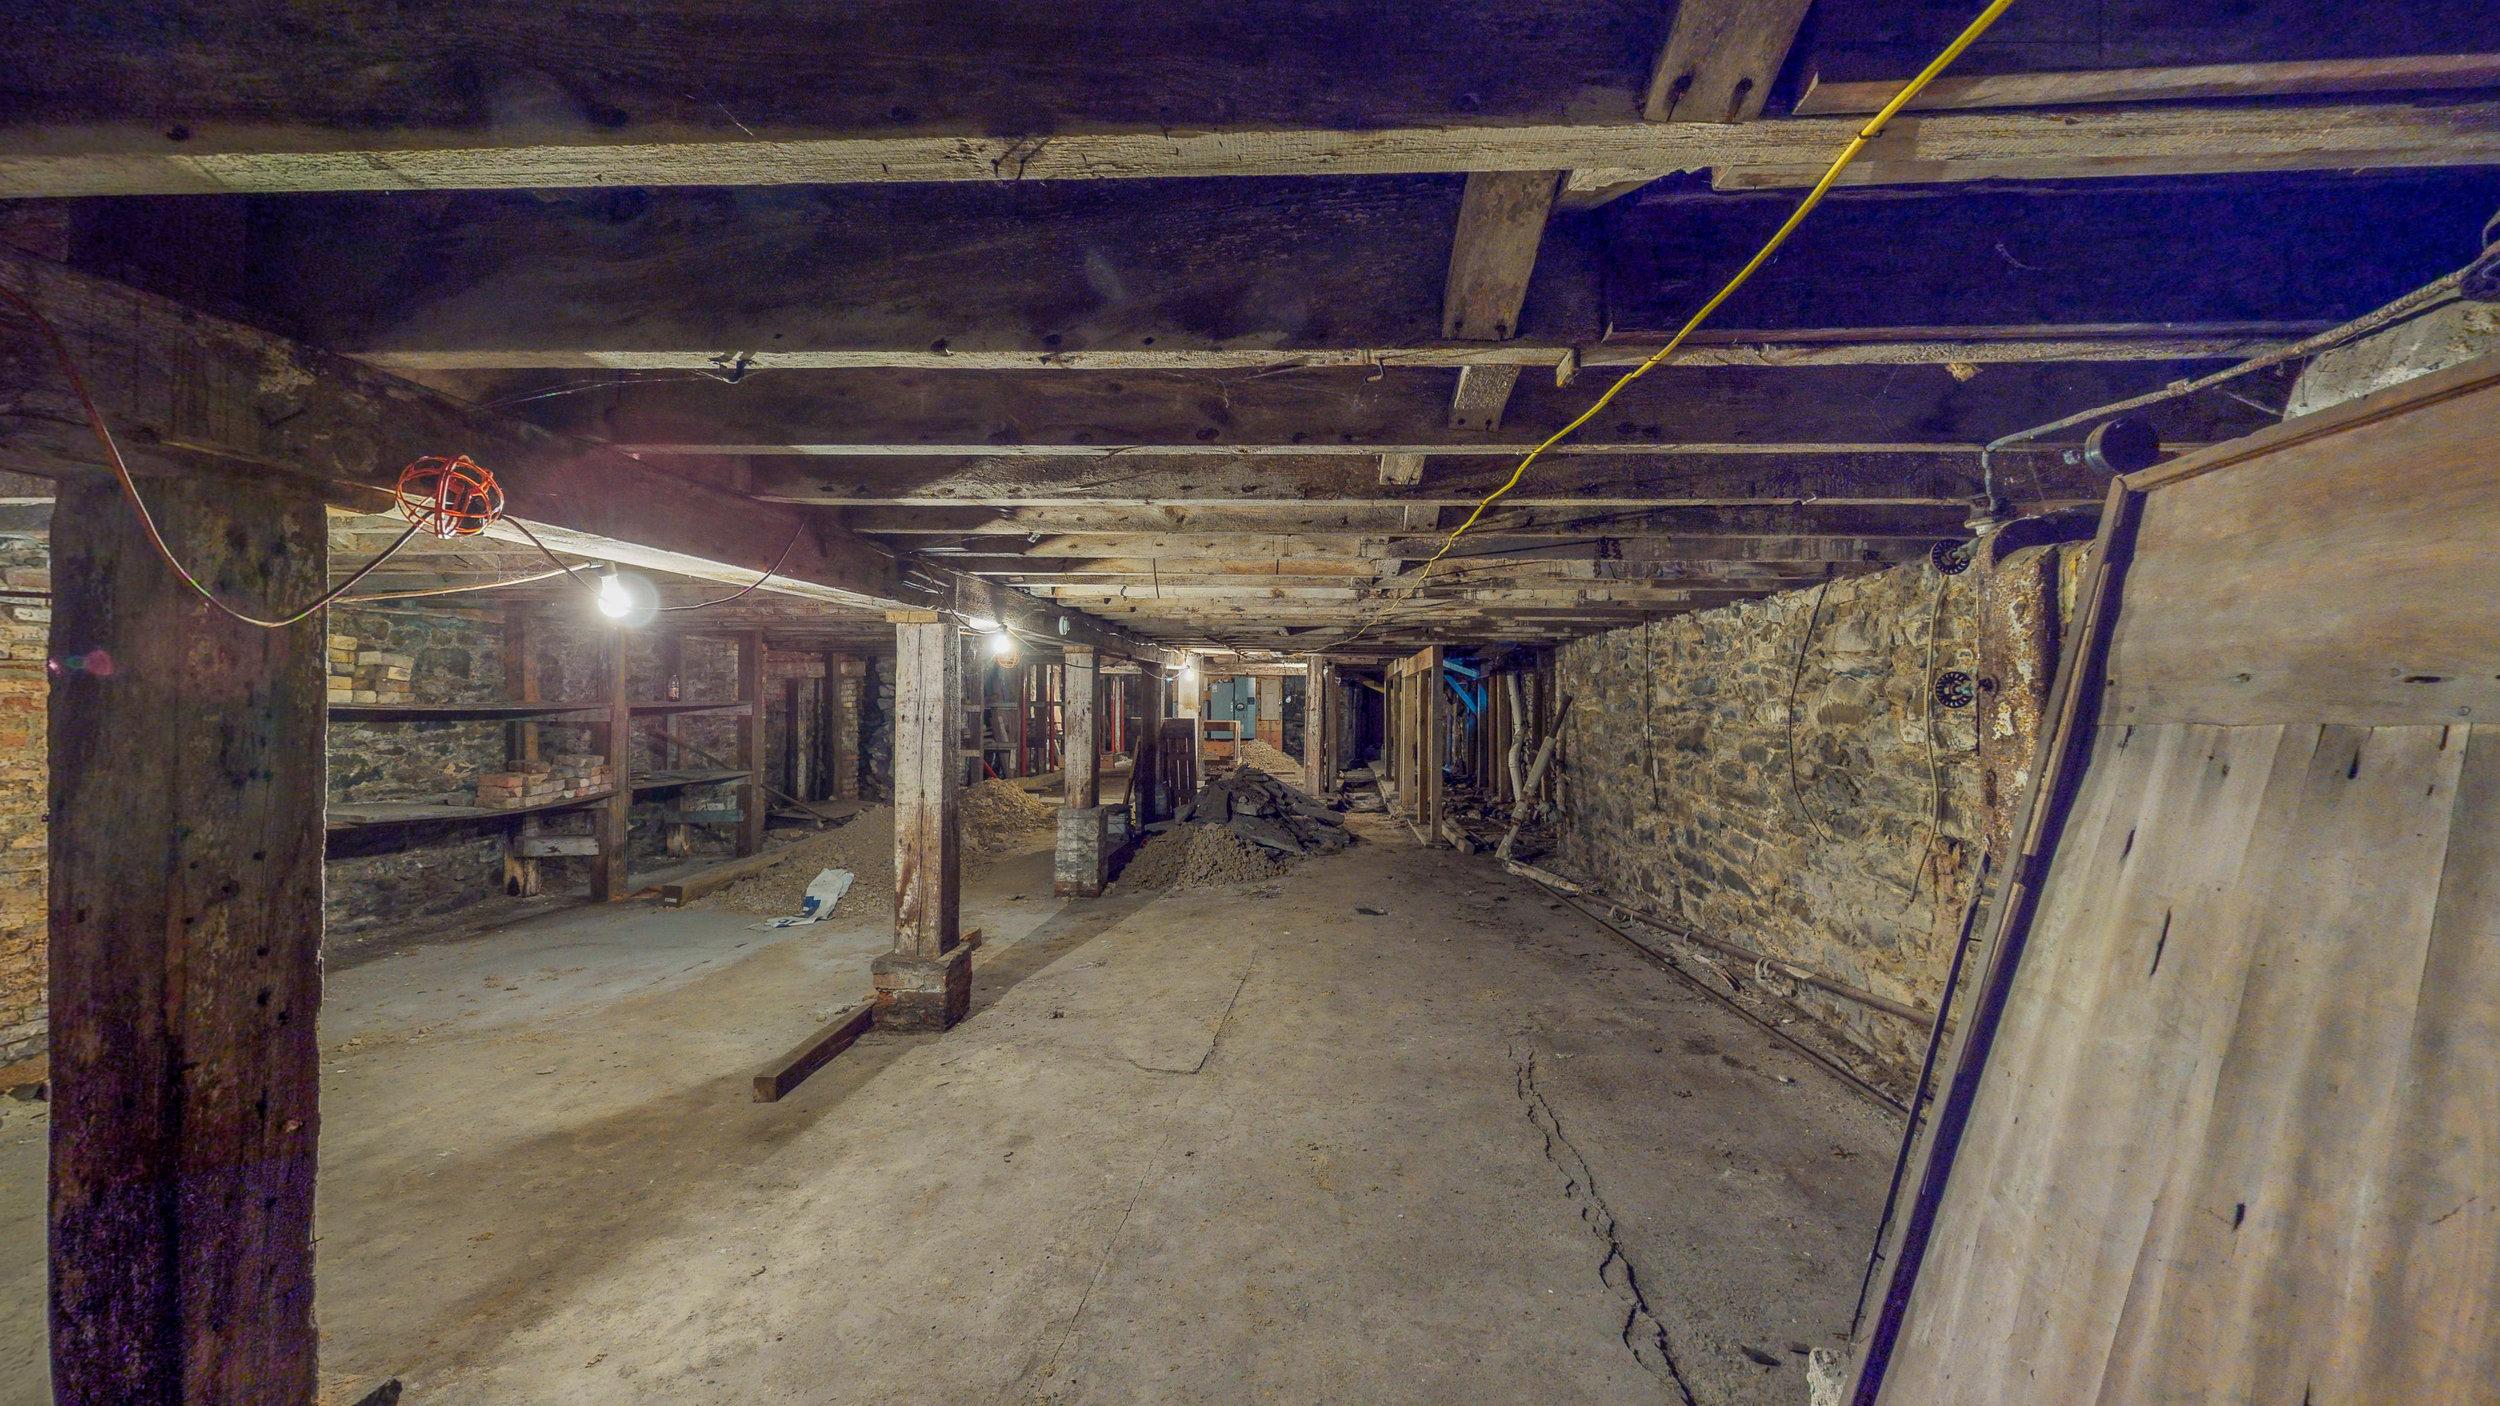 The-Van-Ostrande-Radliff-House-at-48-Hudson-08292019_132024.jpg